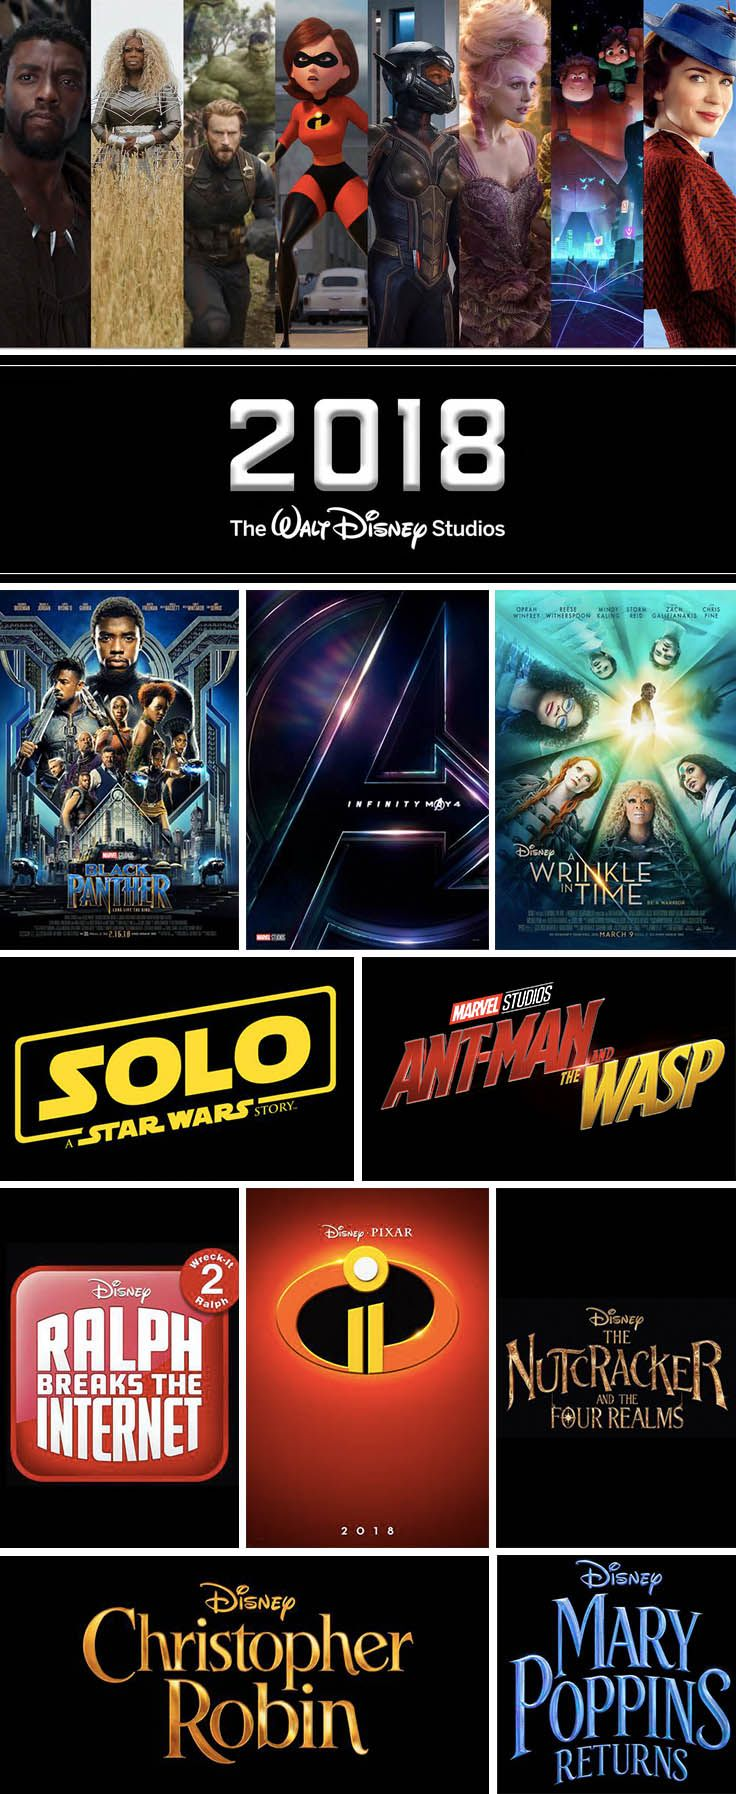 Upcoming 2018 Disney Movies Marvel LucasFilm Pixar